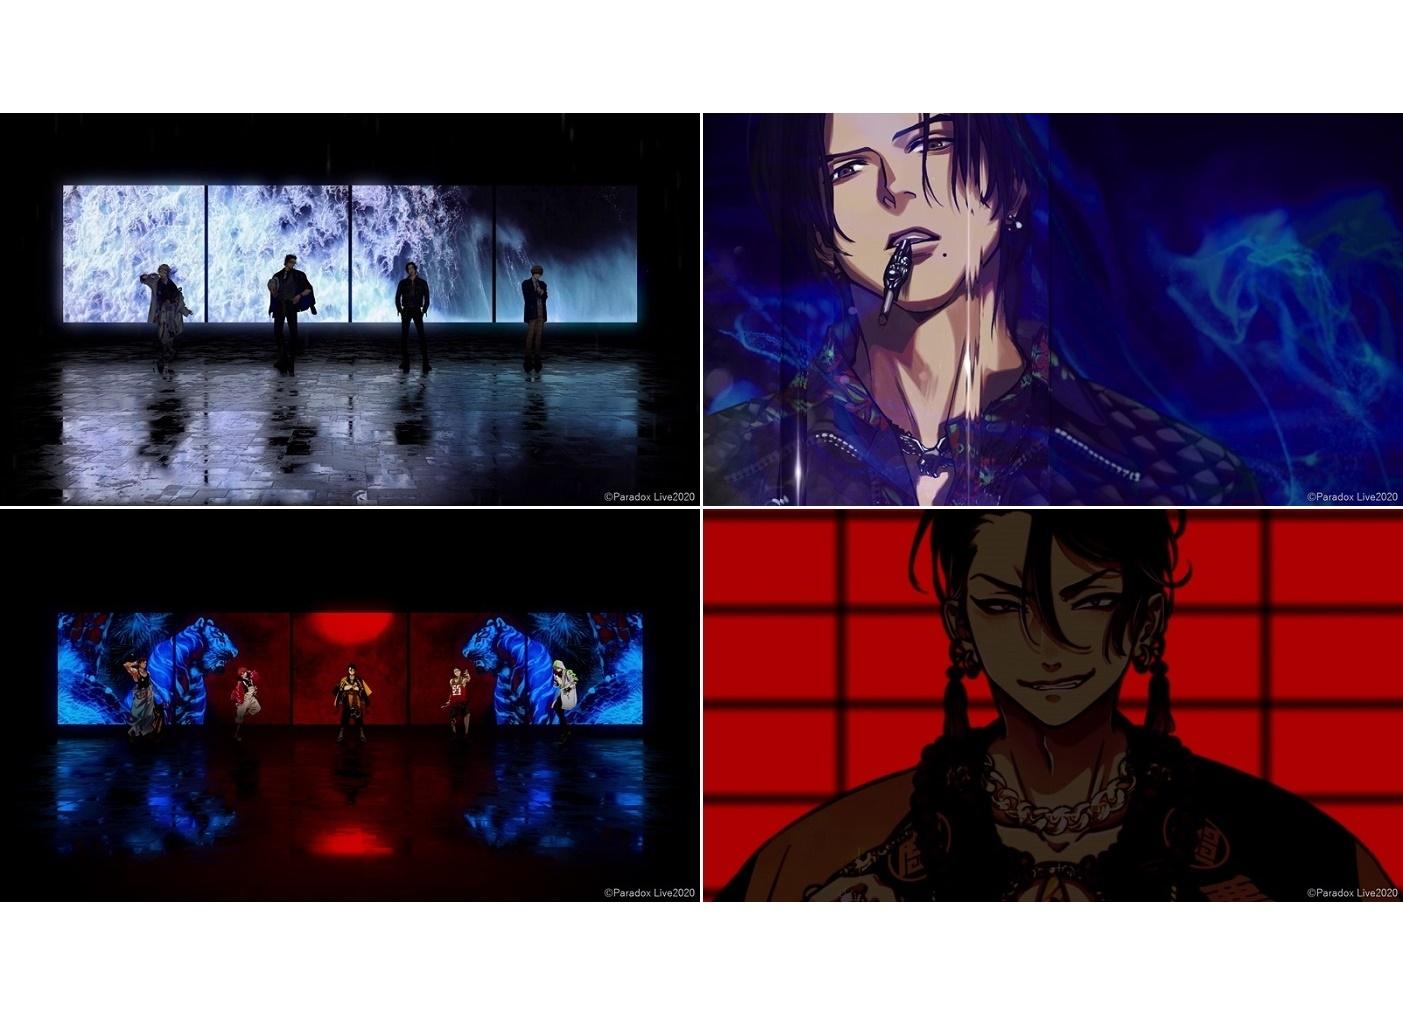 Paradox Live/林勇、近藤孝行らによるラップ楽曲MV解禁